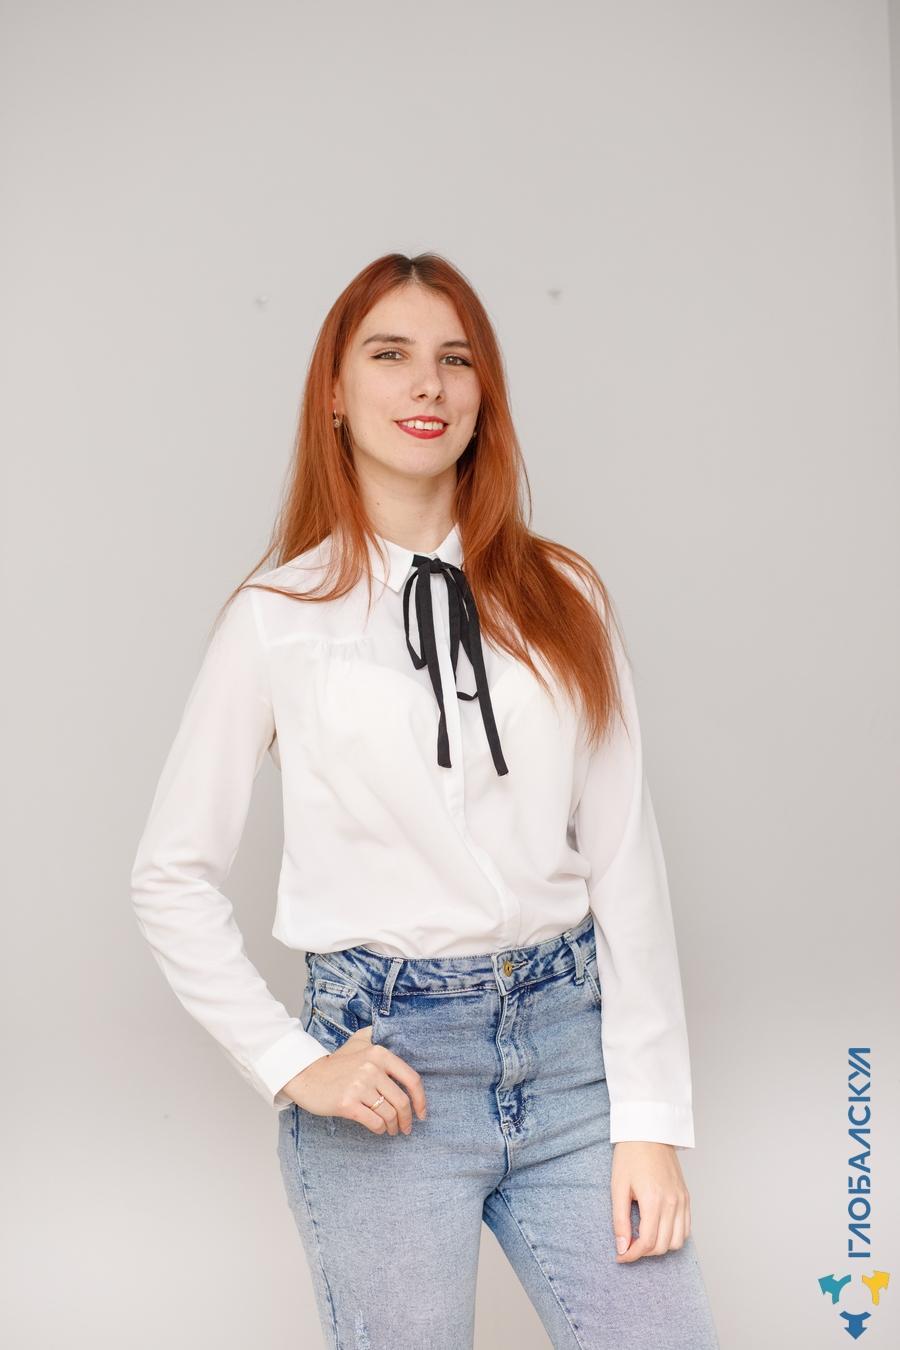 Лазаренко Юлия